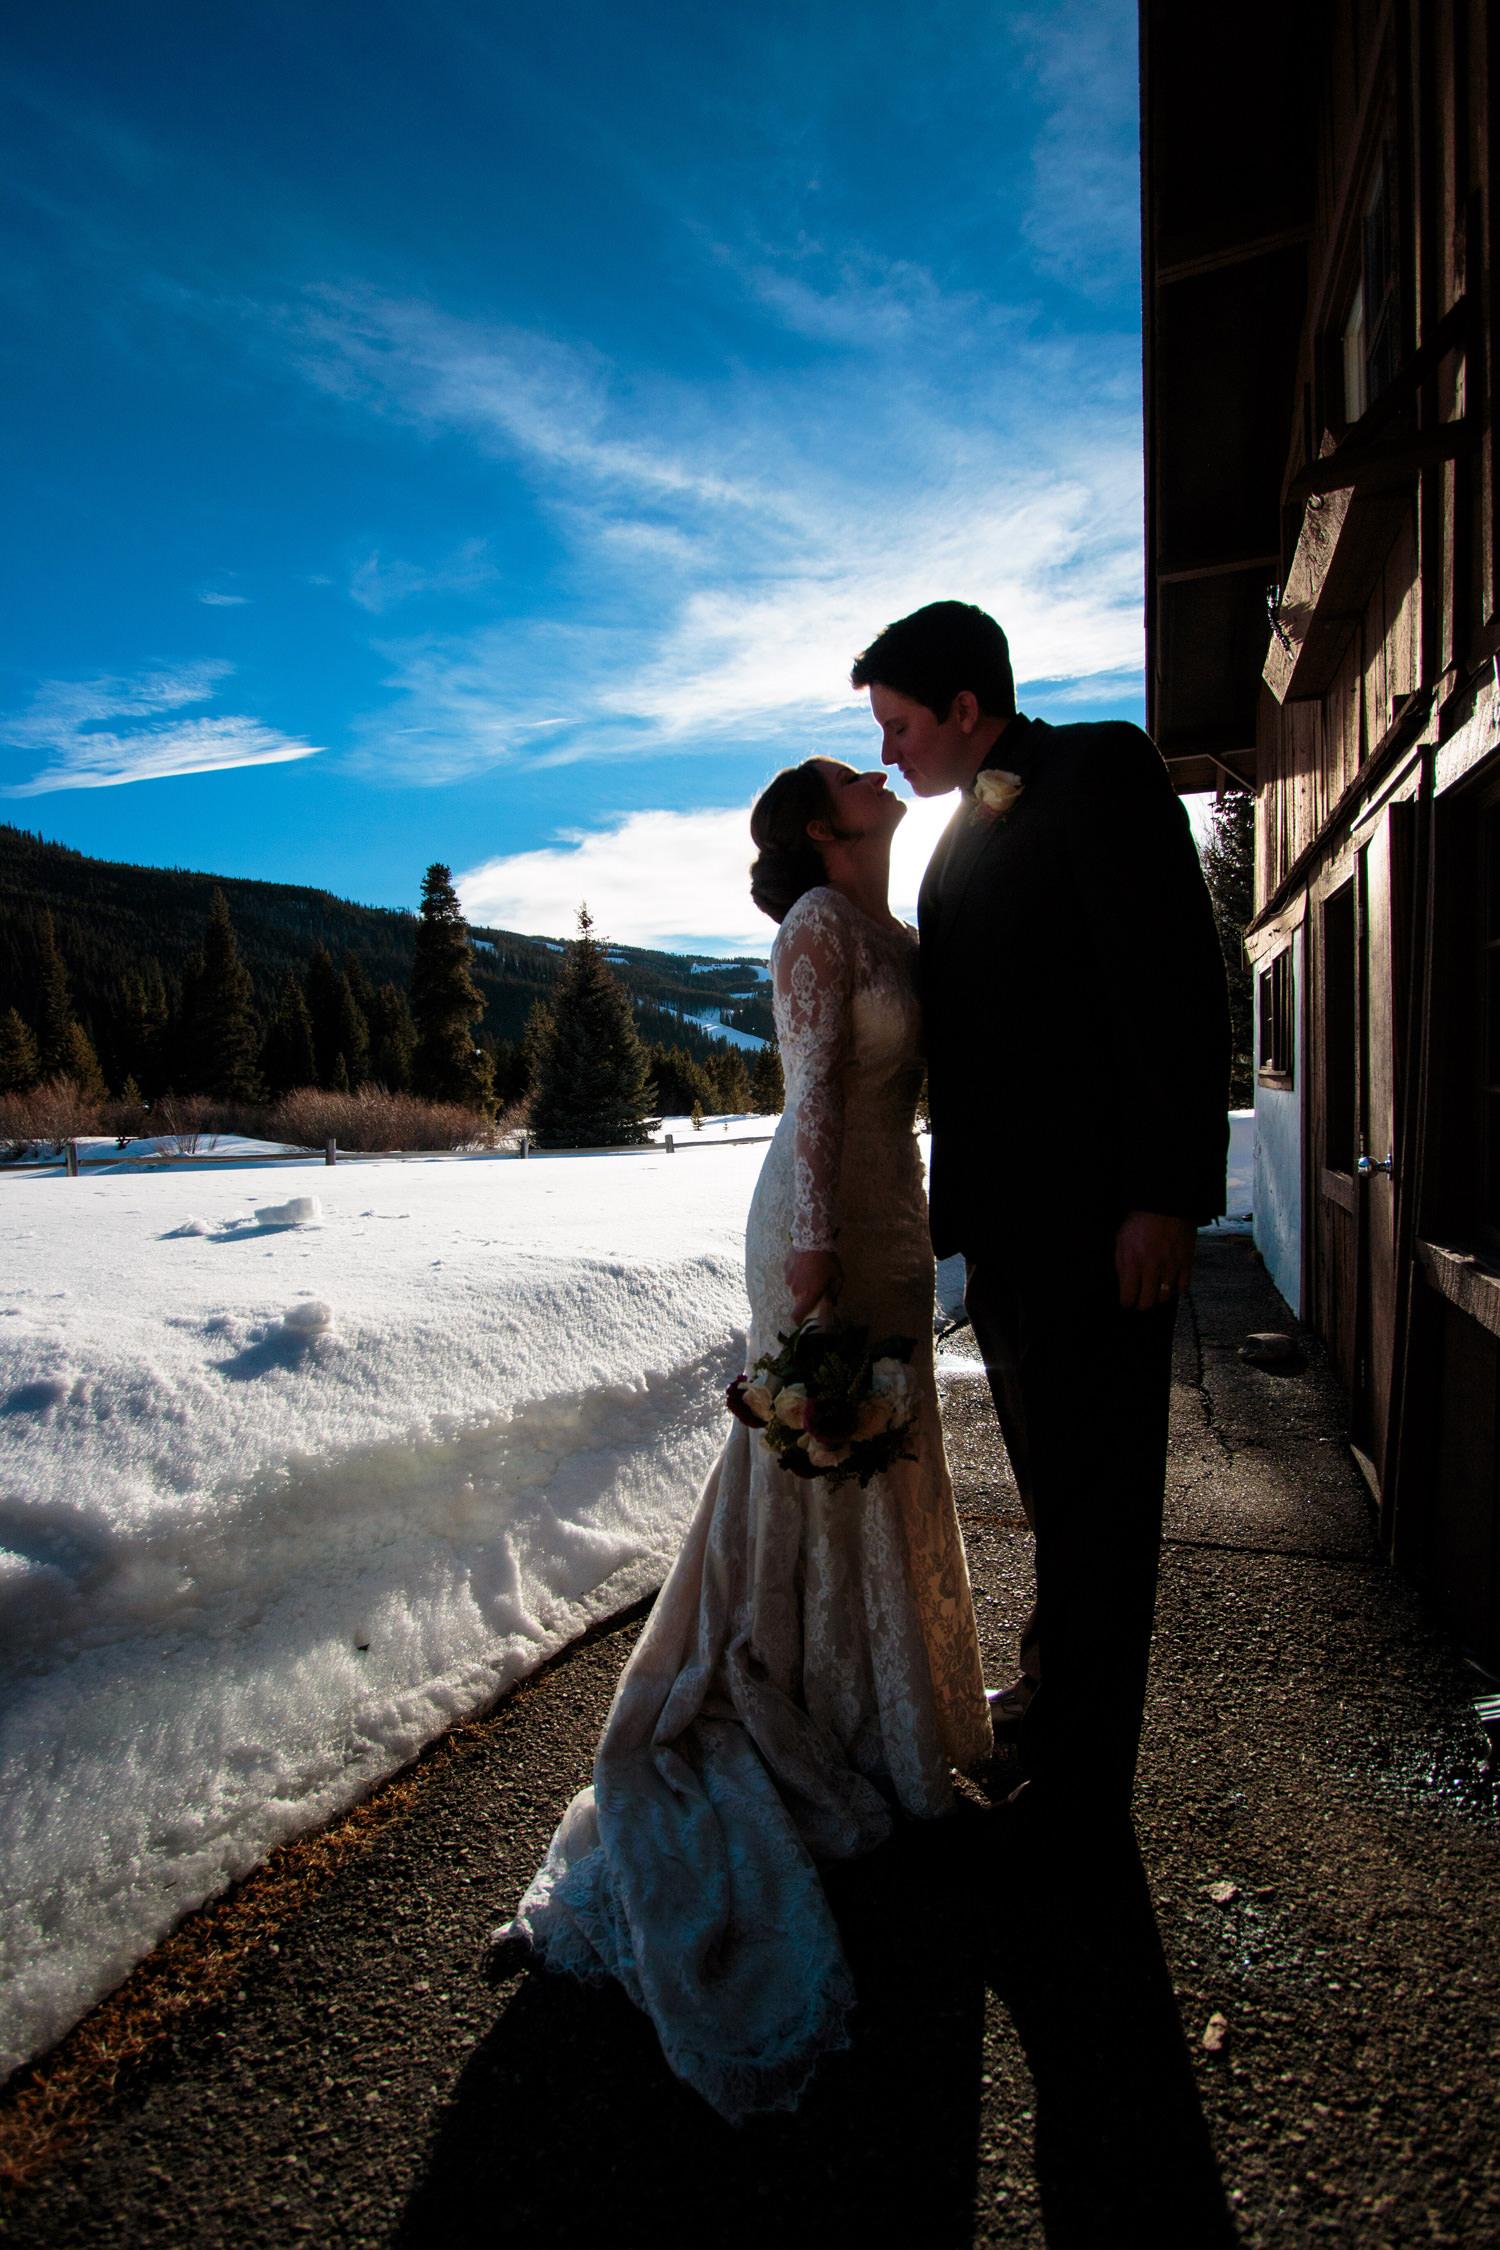 keystone-wedding-photographer-tomKphoto-052.jpg